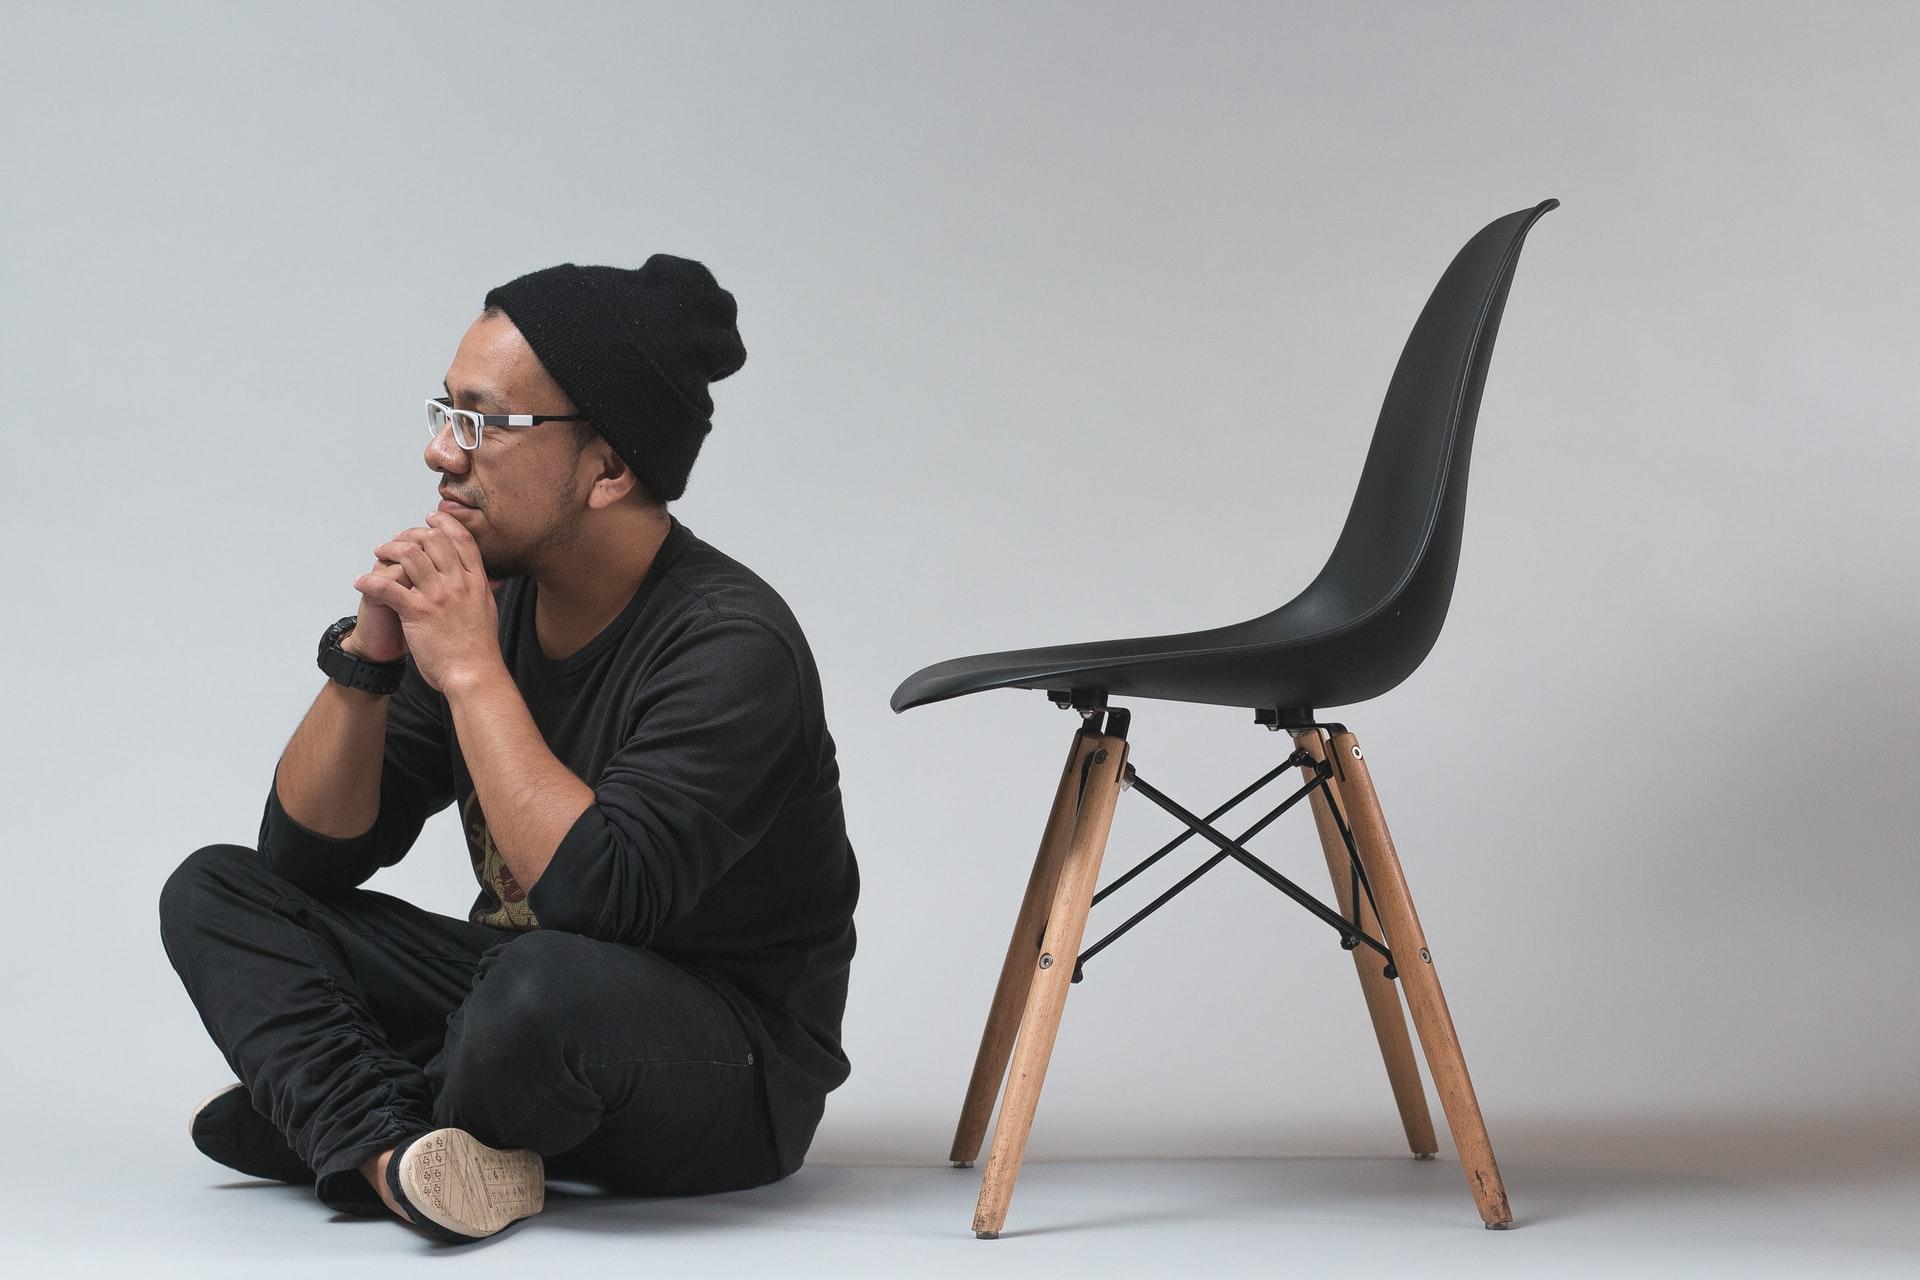 Man sitting next to chair. Photo by @josealjovin via Unsplash